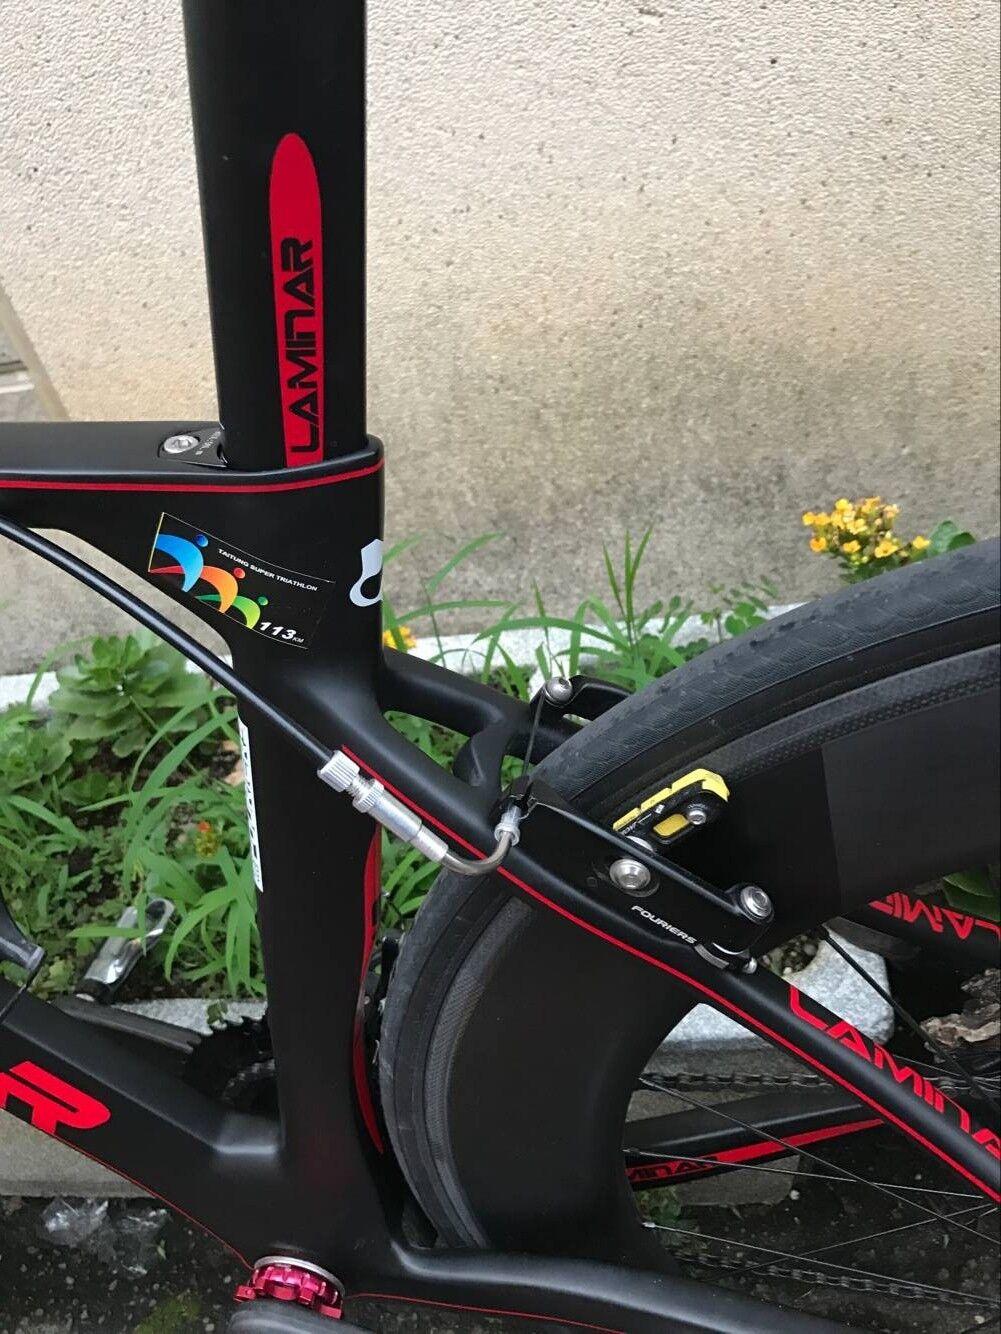 FOURIERS Aero V Brake Set For Giant Propel Road Bike S005 F+R Alloy rim pads